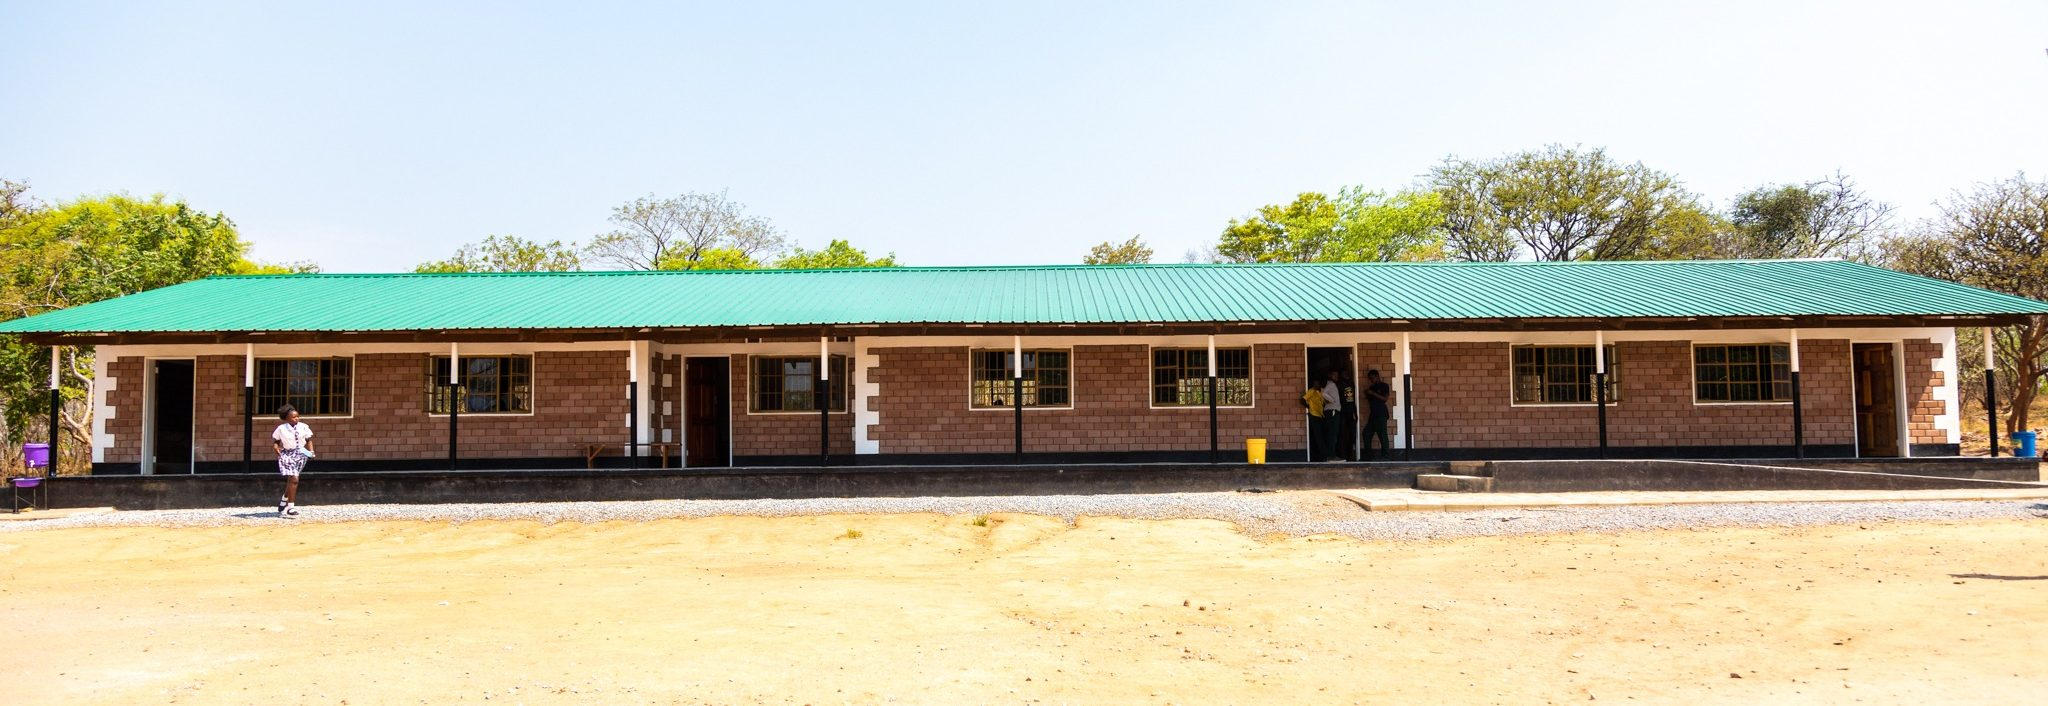 New classrooms at Naluyanda Primary School